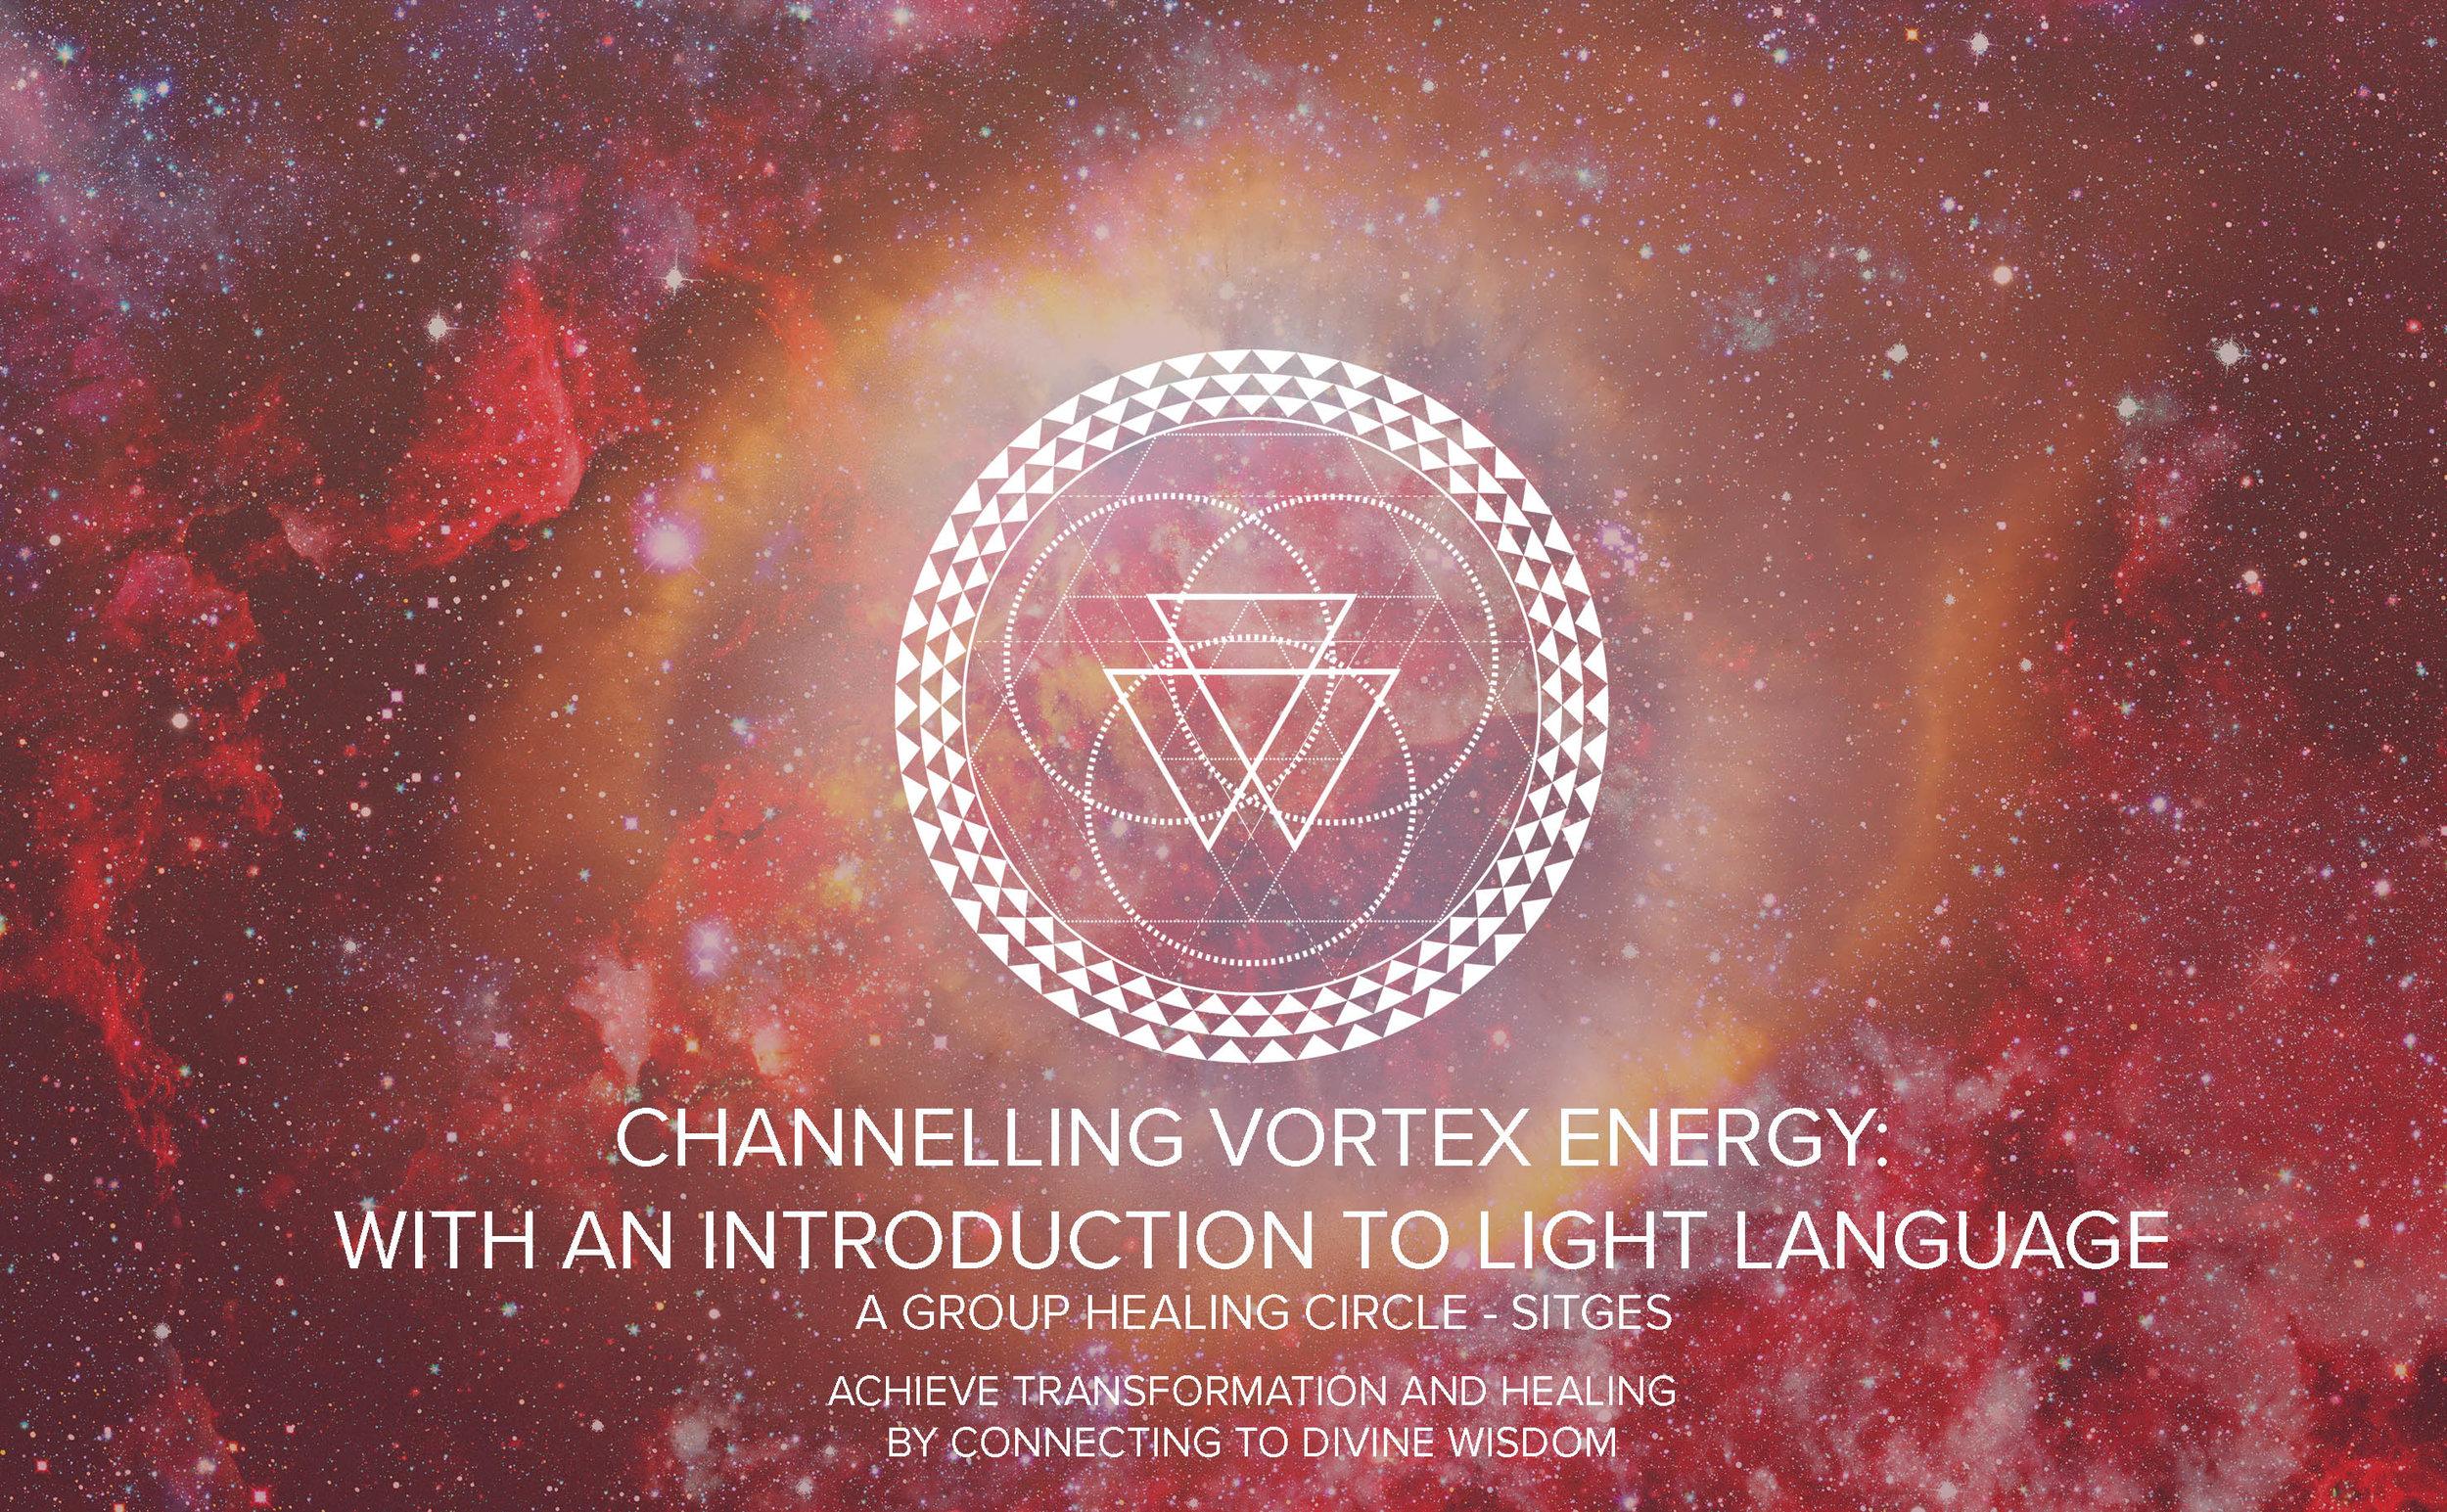 channelling vortex energy small APRIL 2019 EN.jpg